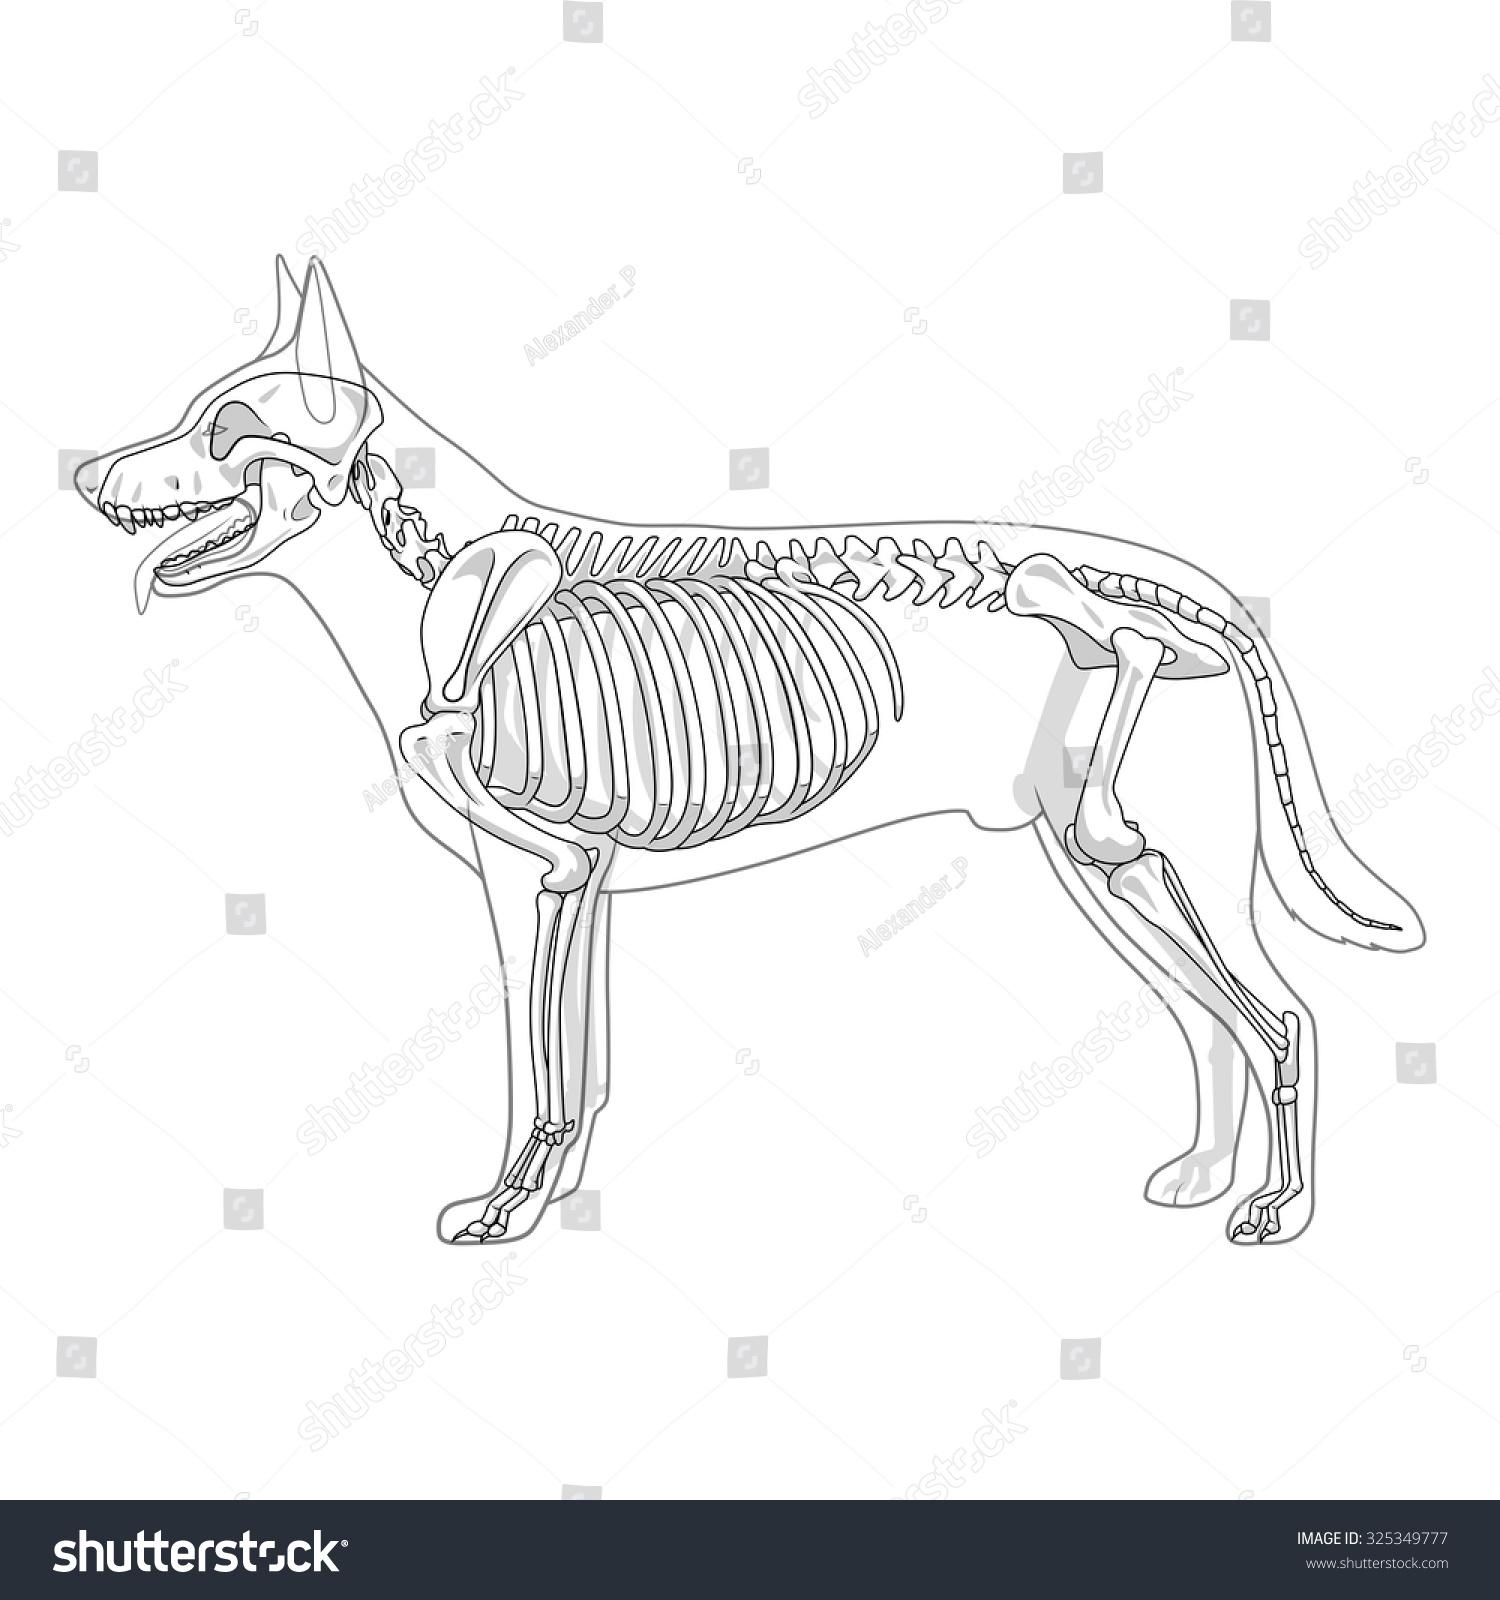 Dog Skeleton Veterinary Vector Illustration Stock Squirrel Diagram The Of A Greyhound Osteology Bones